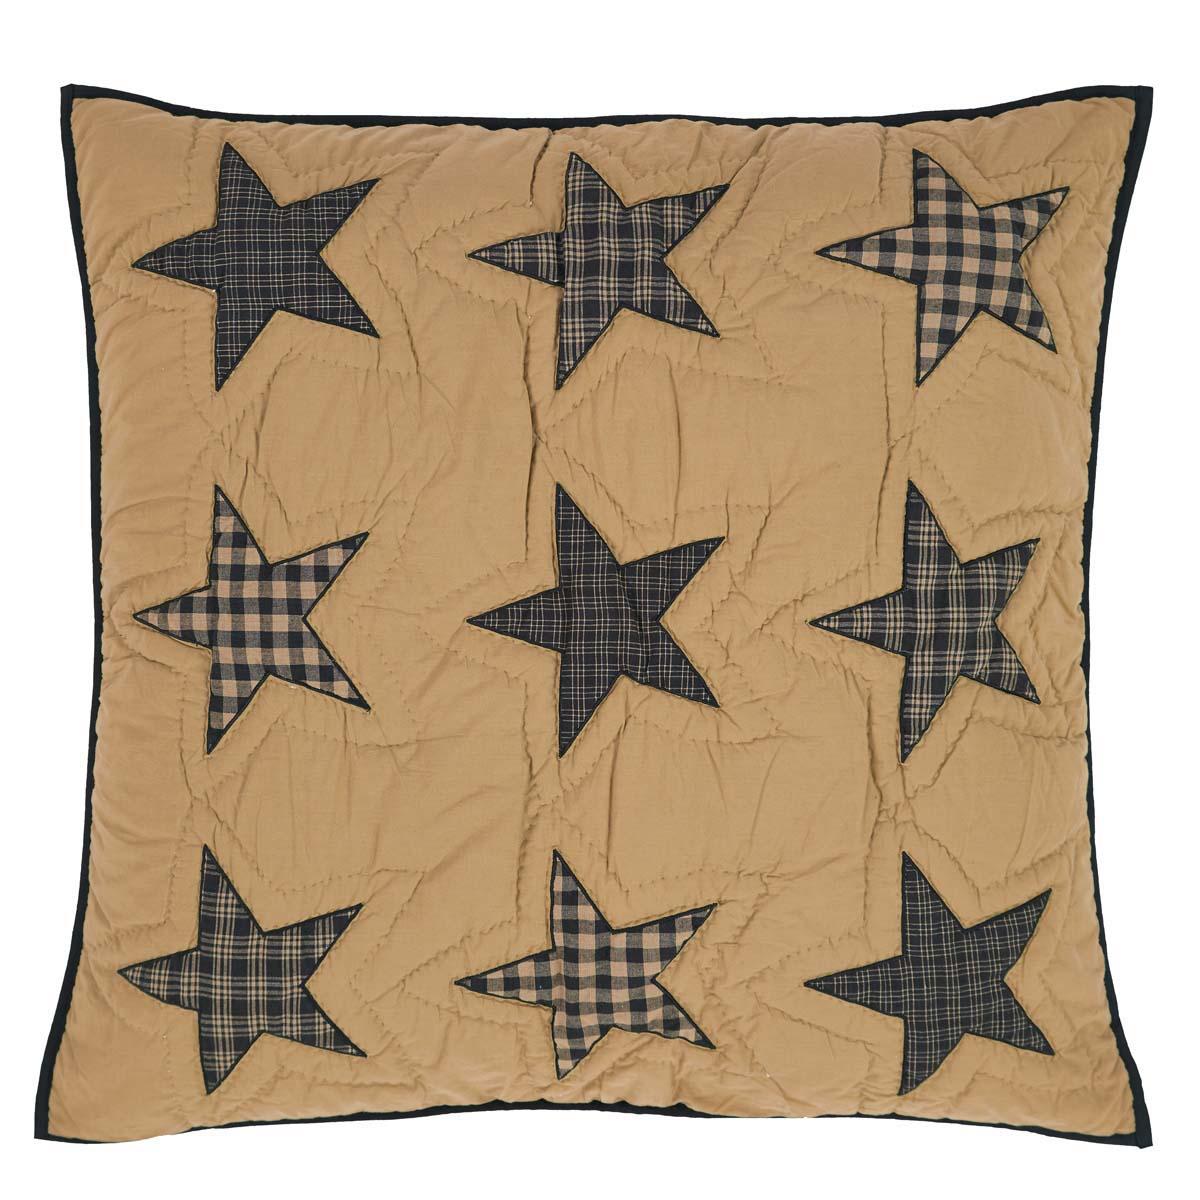 Teton Star Quilted Euro Sham 26x26